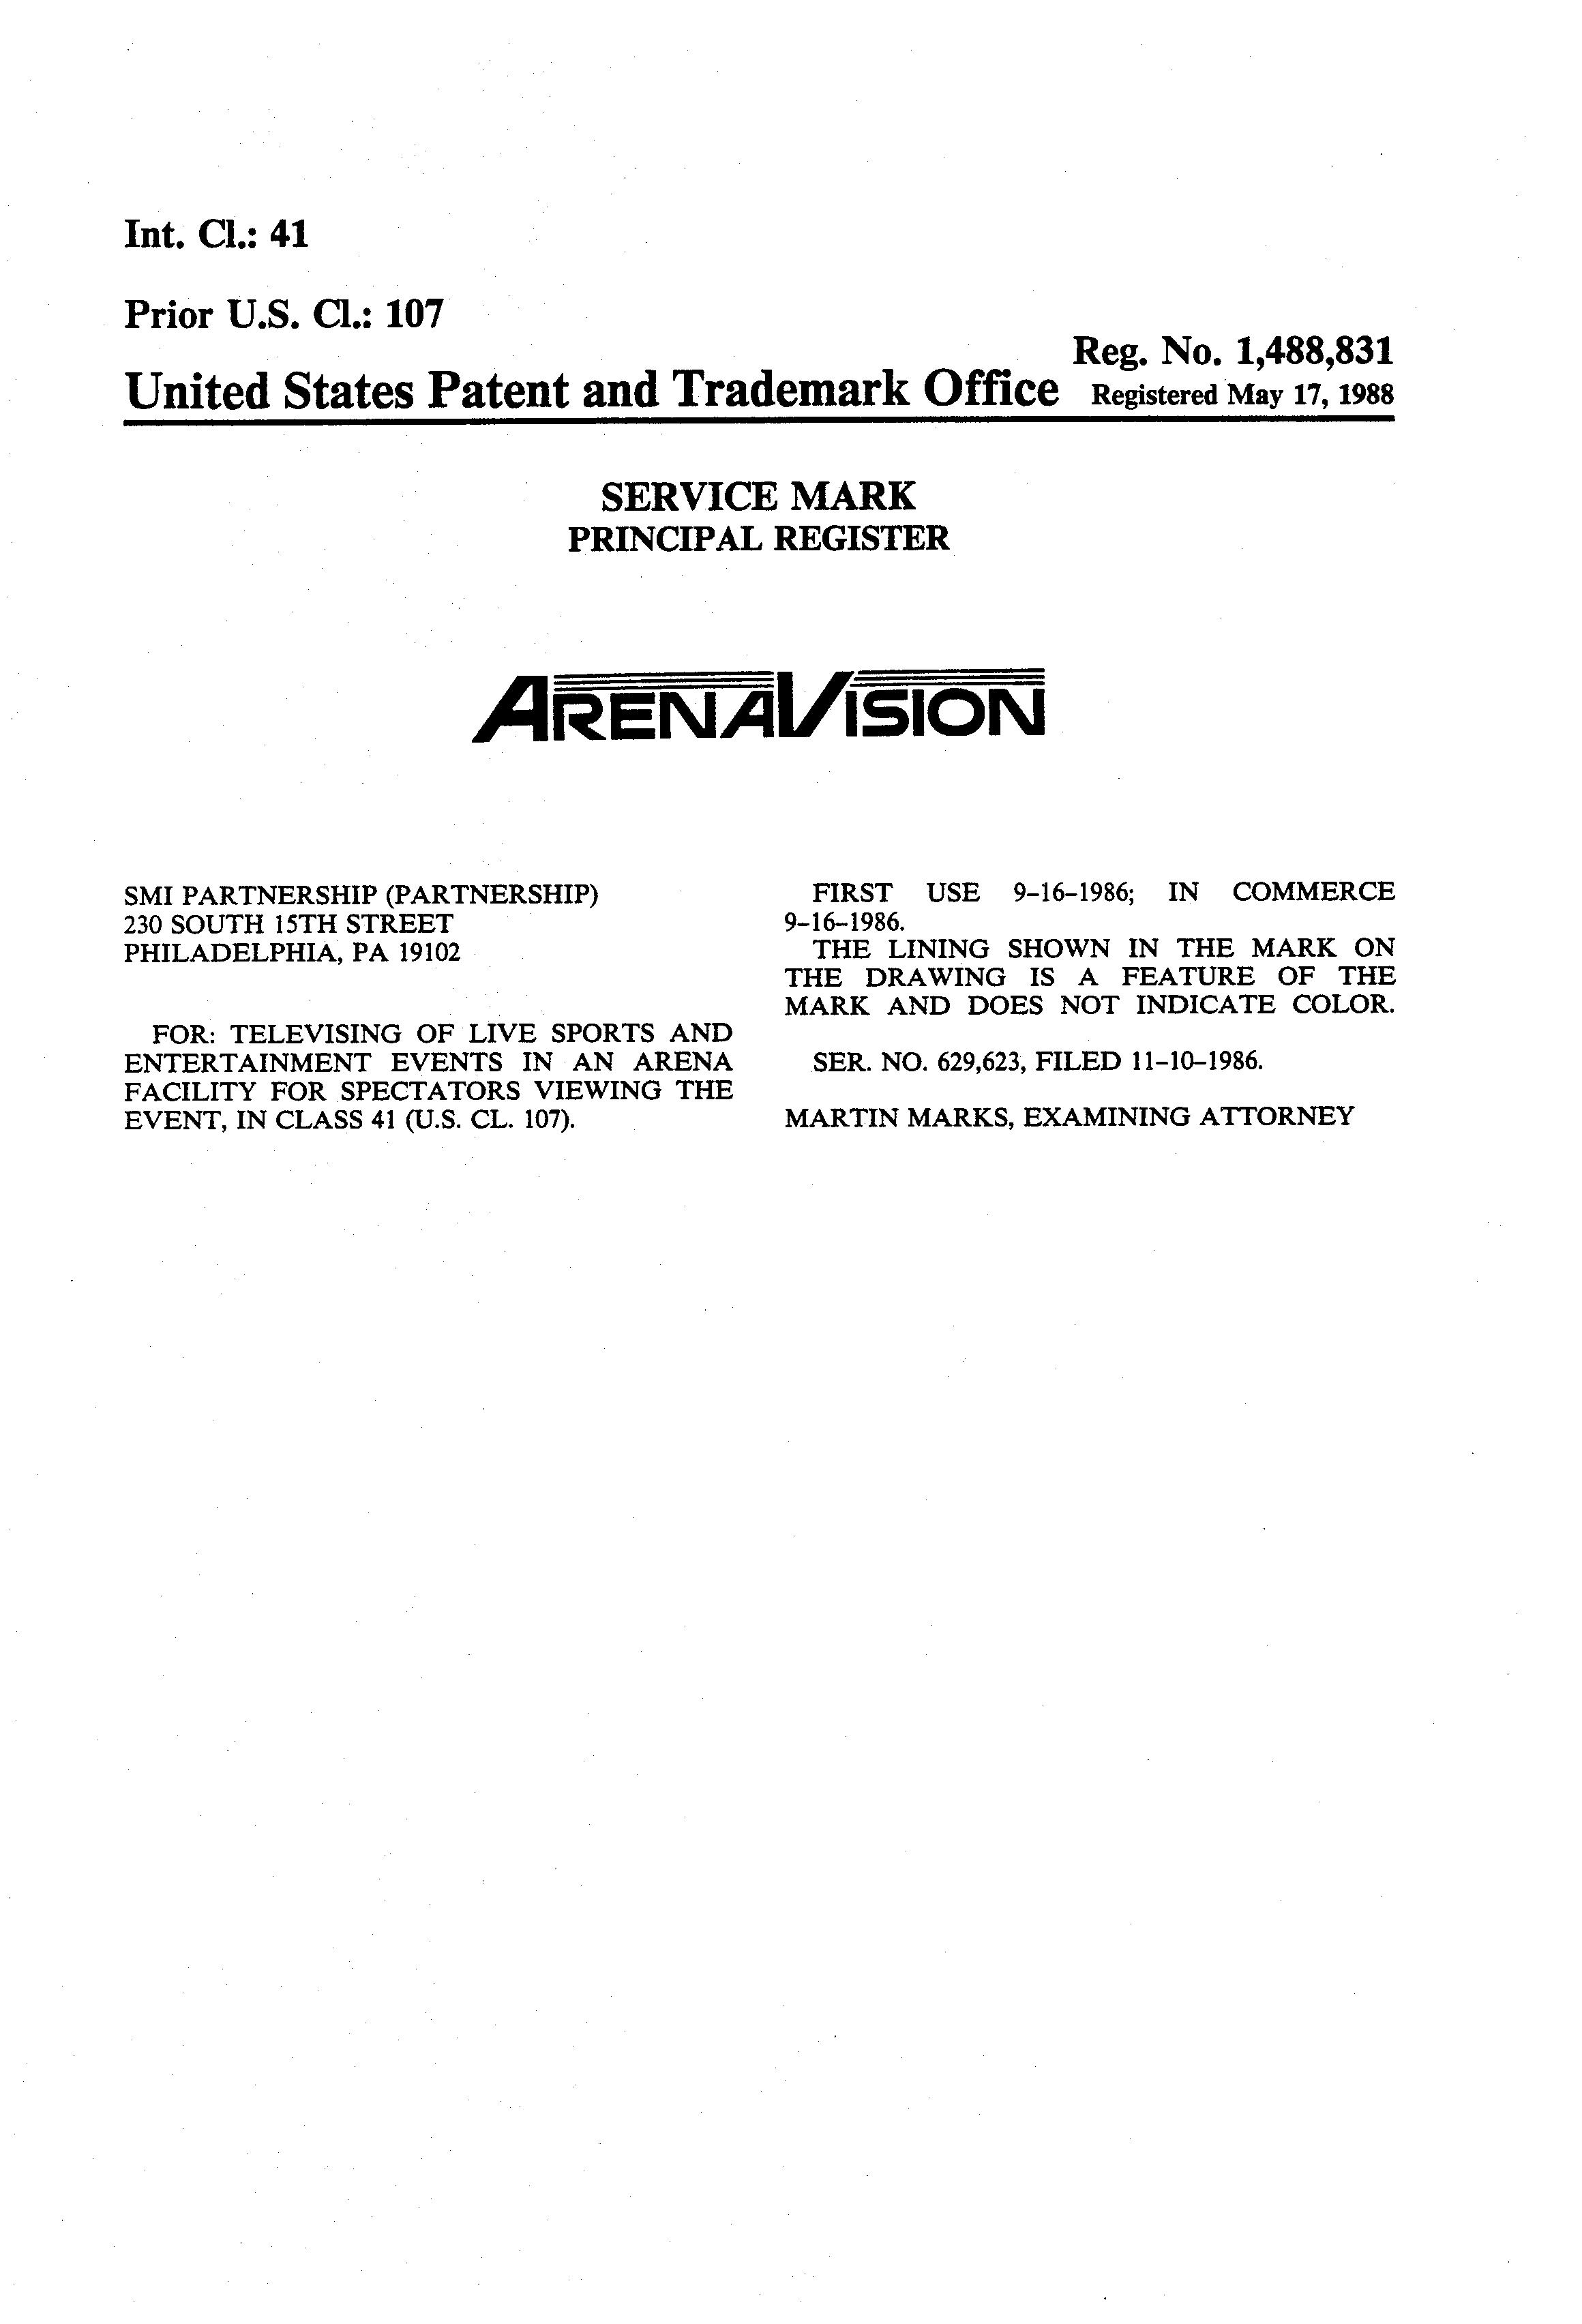 ARENAVISION Details, a Report by Trademark Bank | Calendar